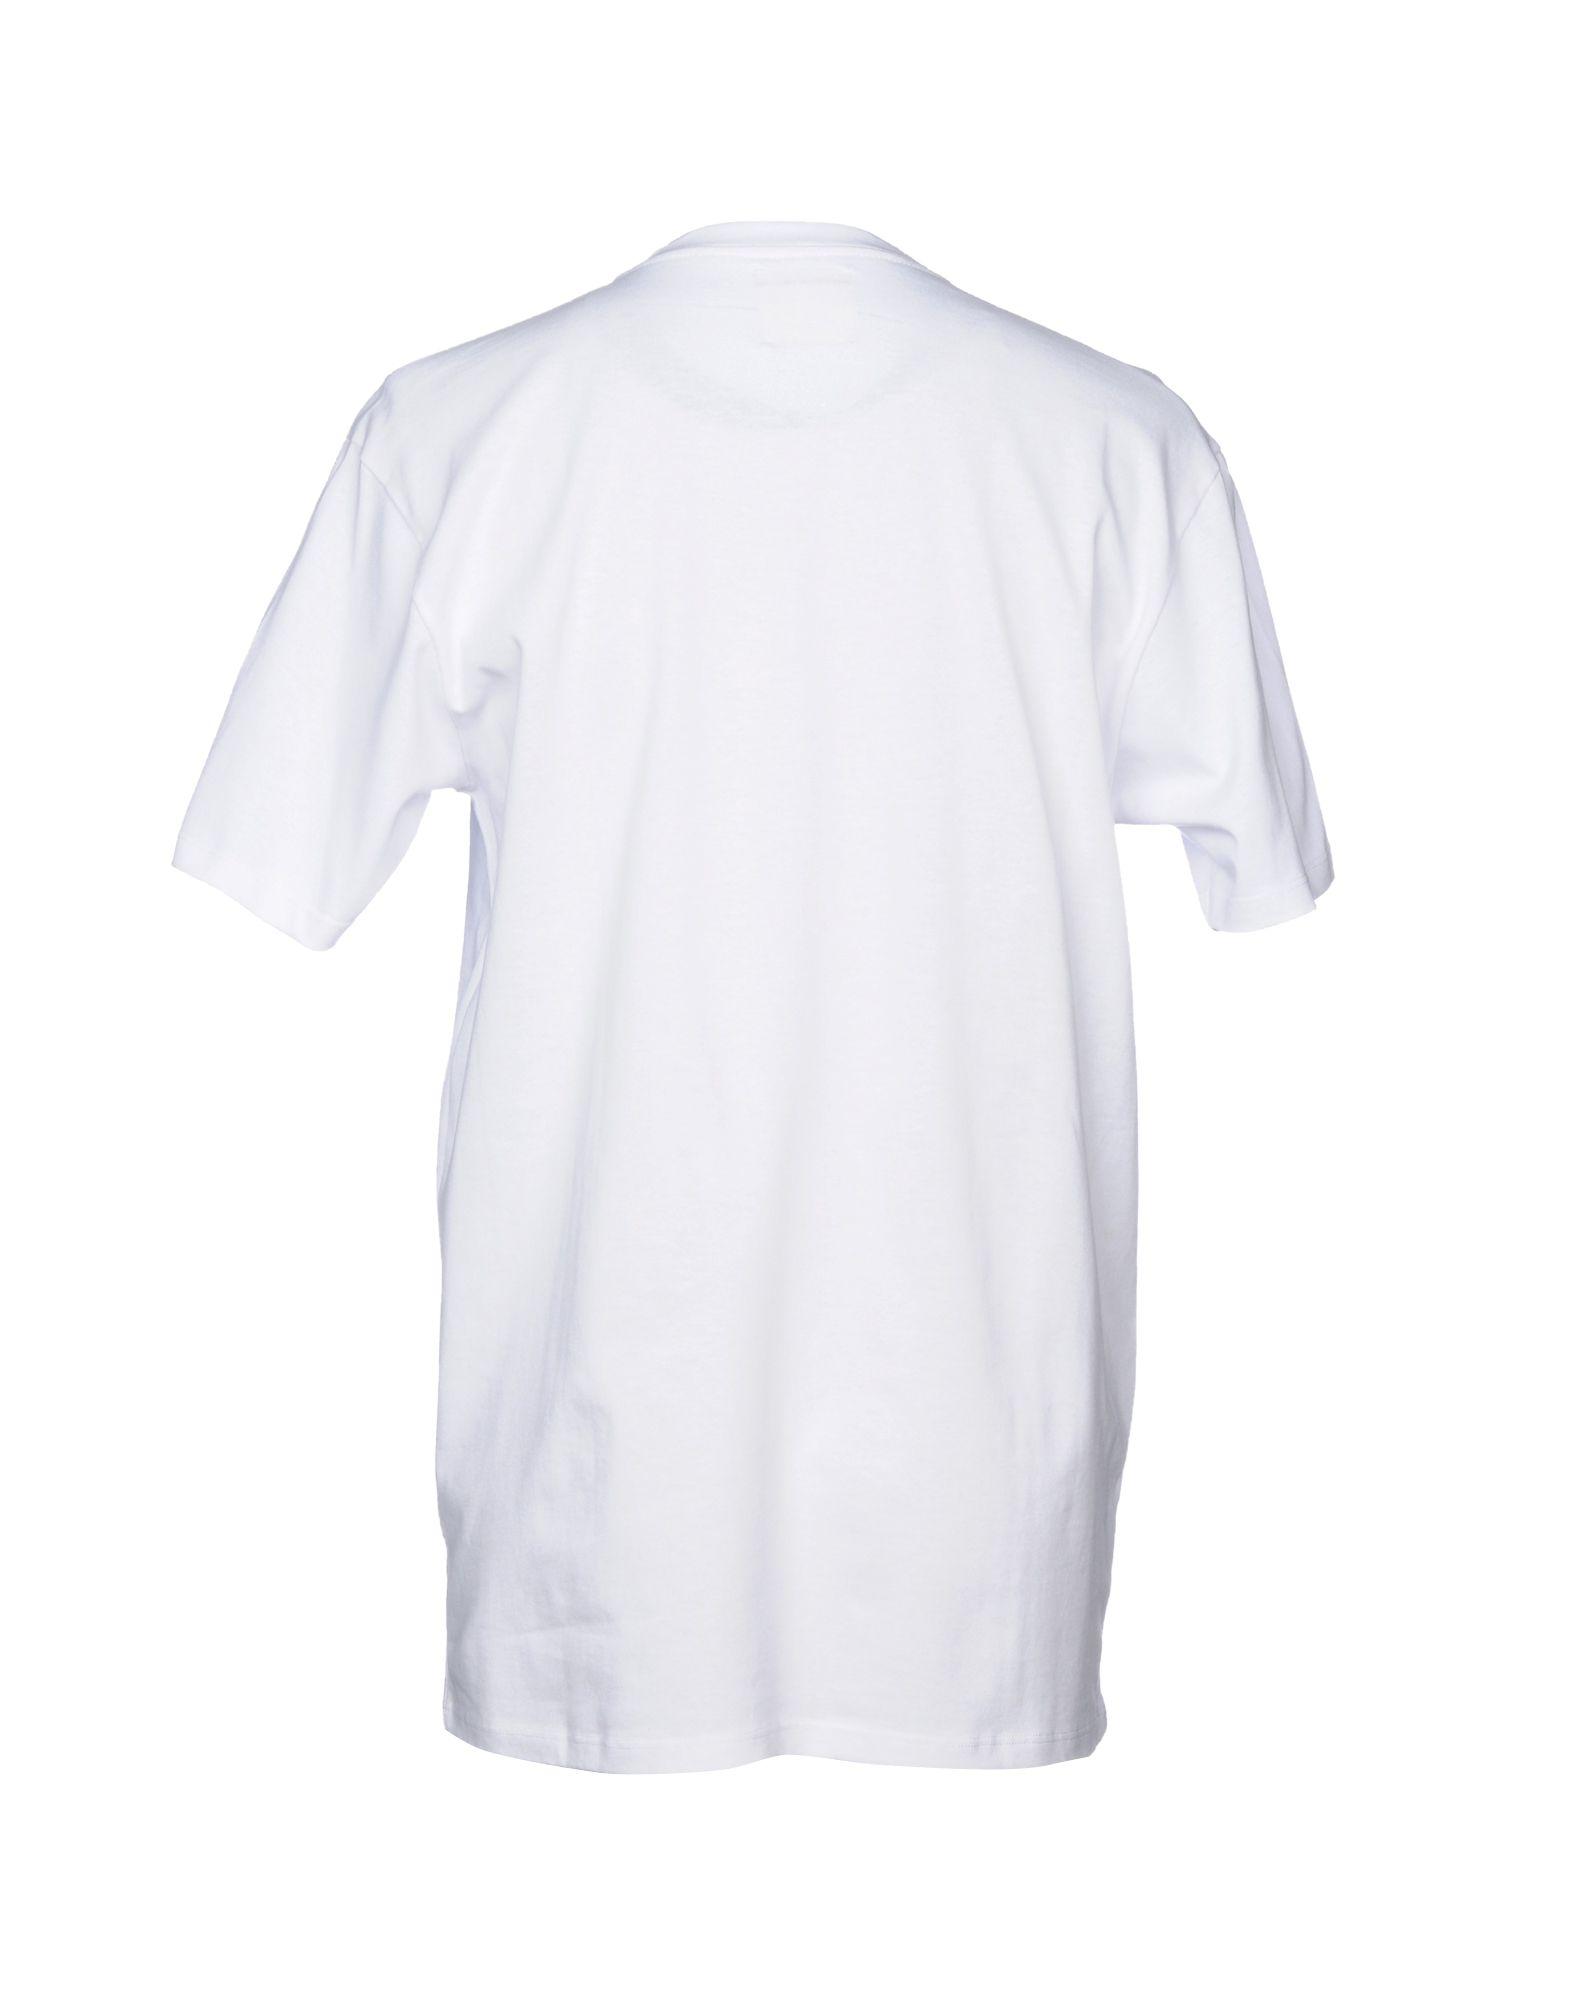 T-Shirt Pmds Premium Mood Denim Denim Mood Superior Uomo - 12193303QQ c0a35a